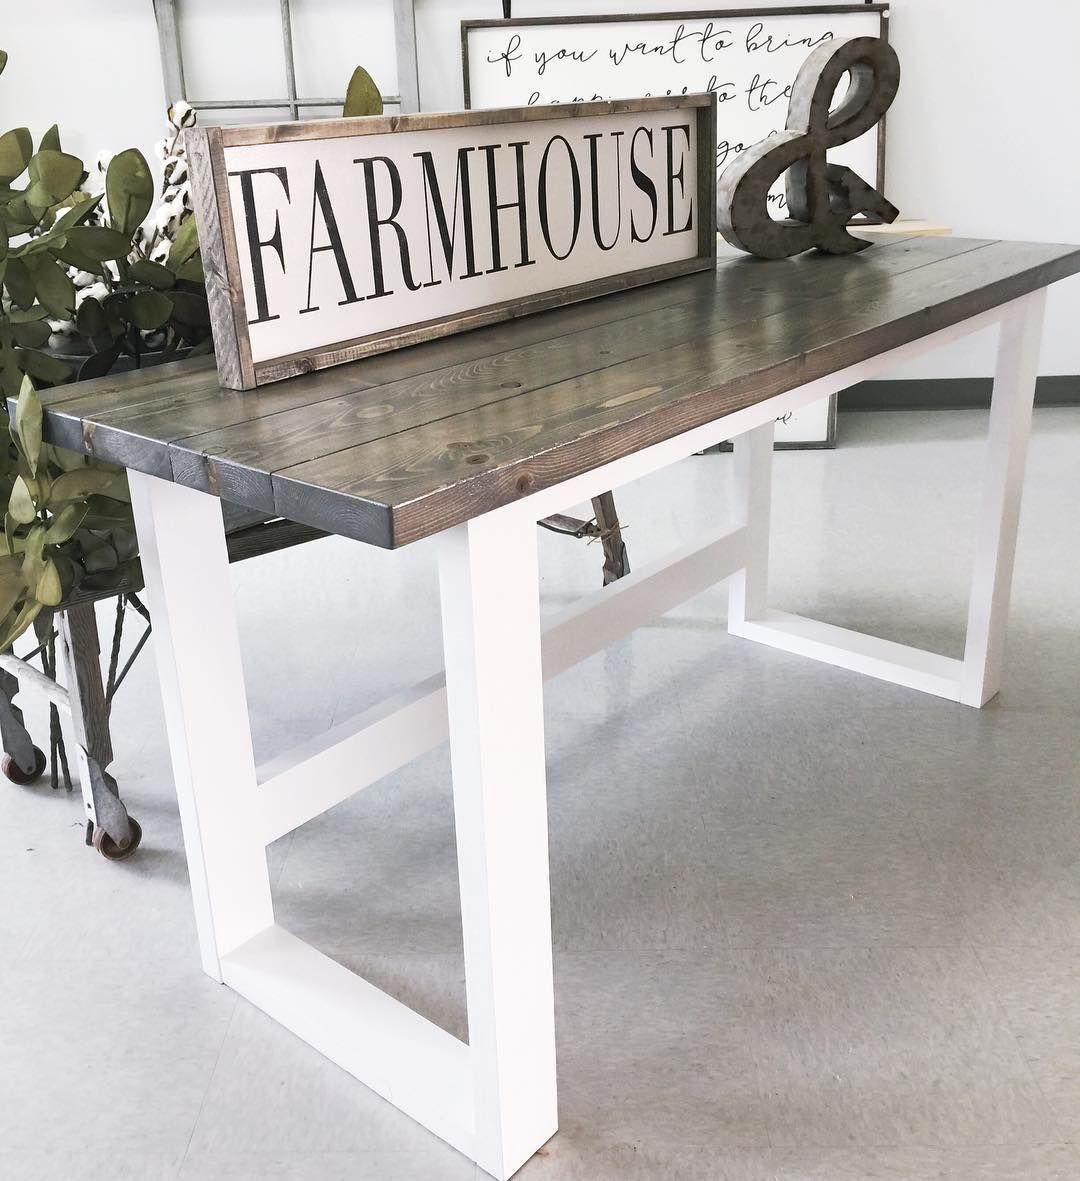 Farmhouse Decor Farmhouse Design Rustic Furniture Diy Desk Ana White Modern Farmhouse Rustic Furniture Diy Rustic Furniture Farmhouse Office Decor